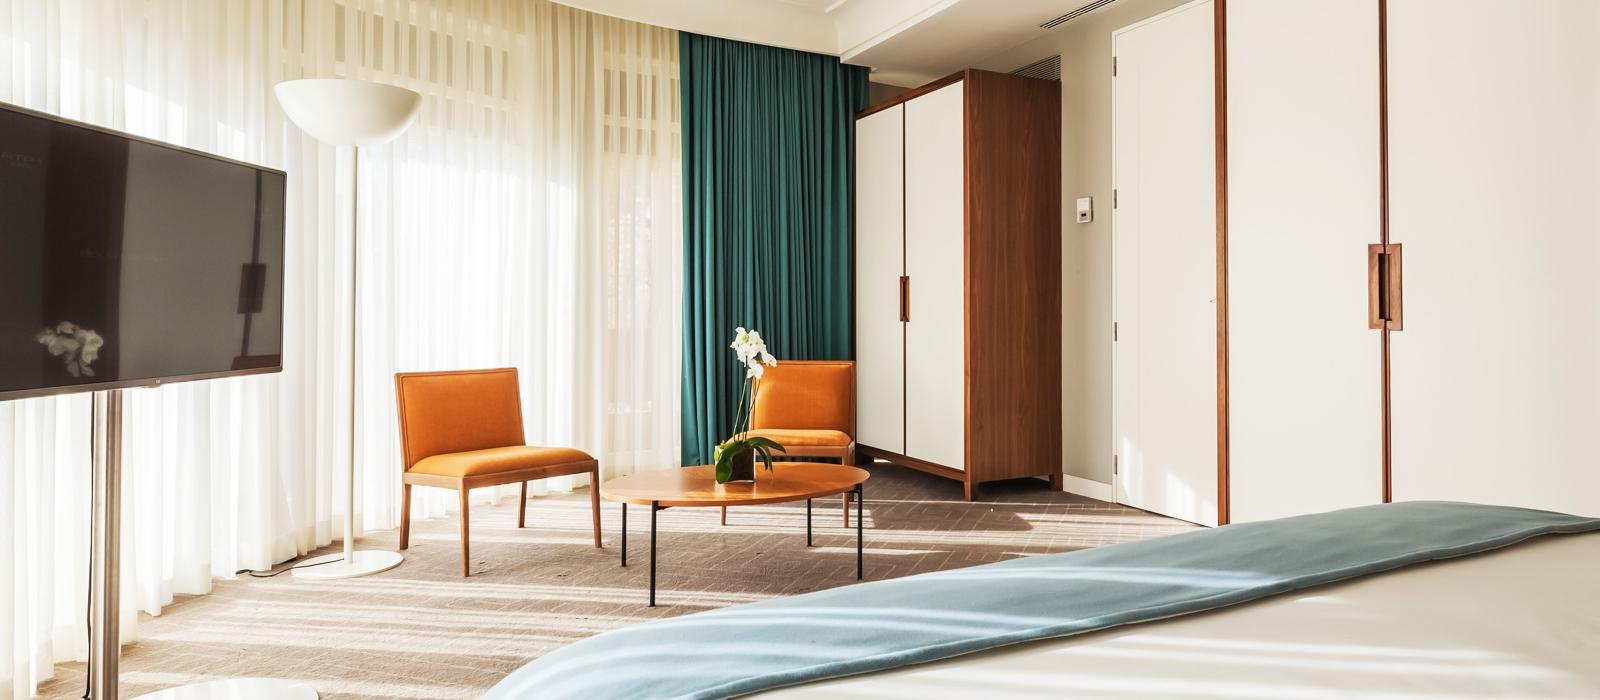 Suite Room Hotel Porto - Vincci Hoteles